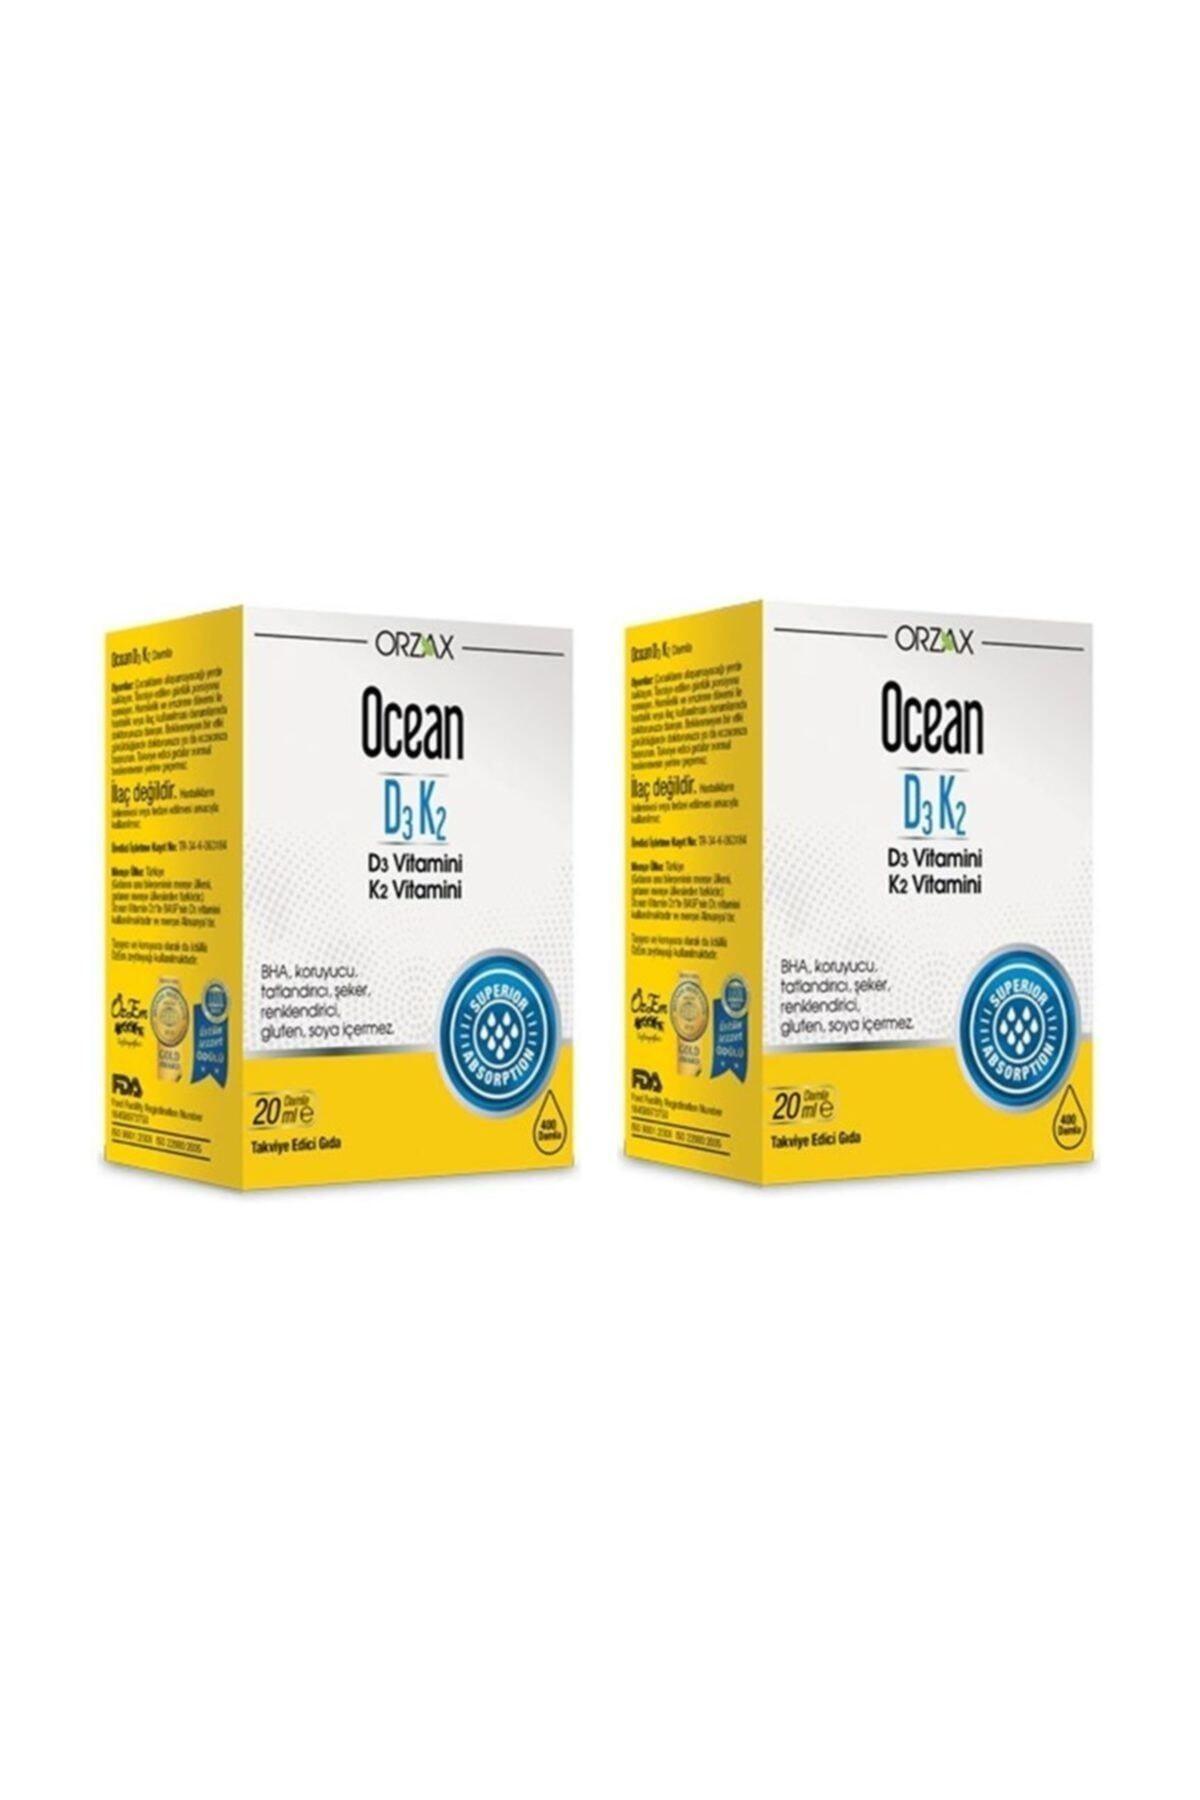 Ocean Orzax Ocean Vitamin D3k2 Damla 20 ml 2'li Paket (Miad 12/2022) 1